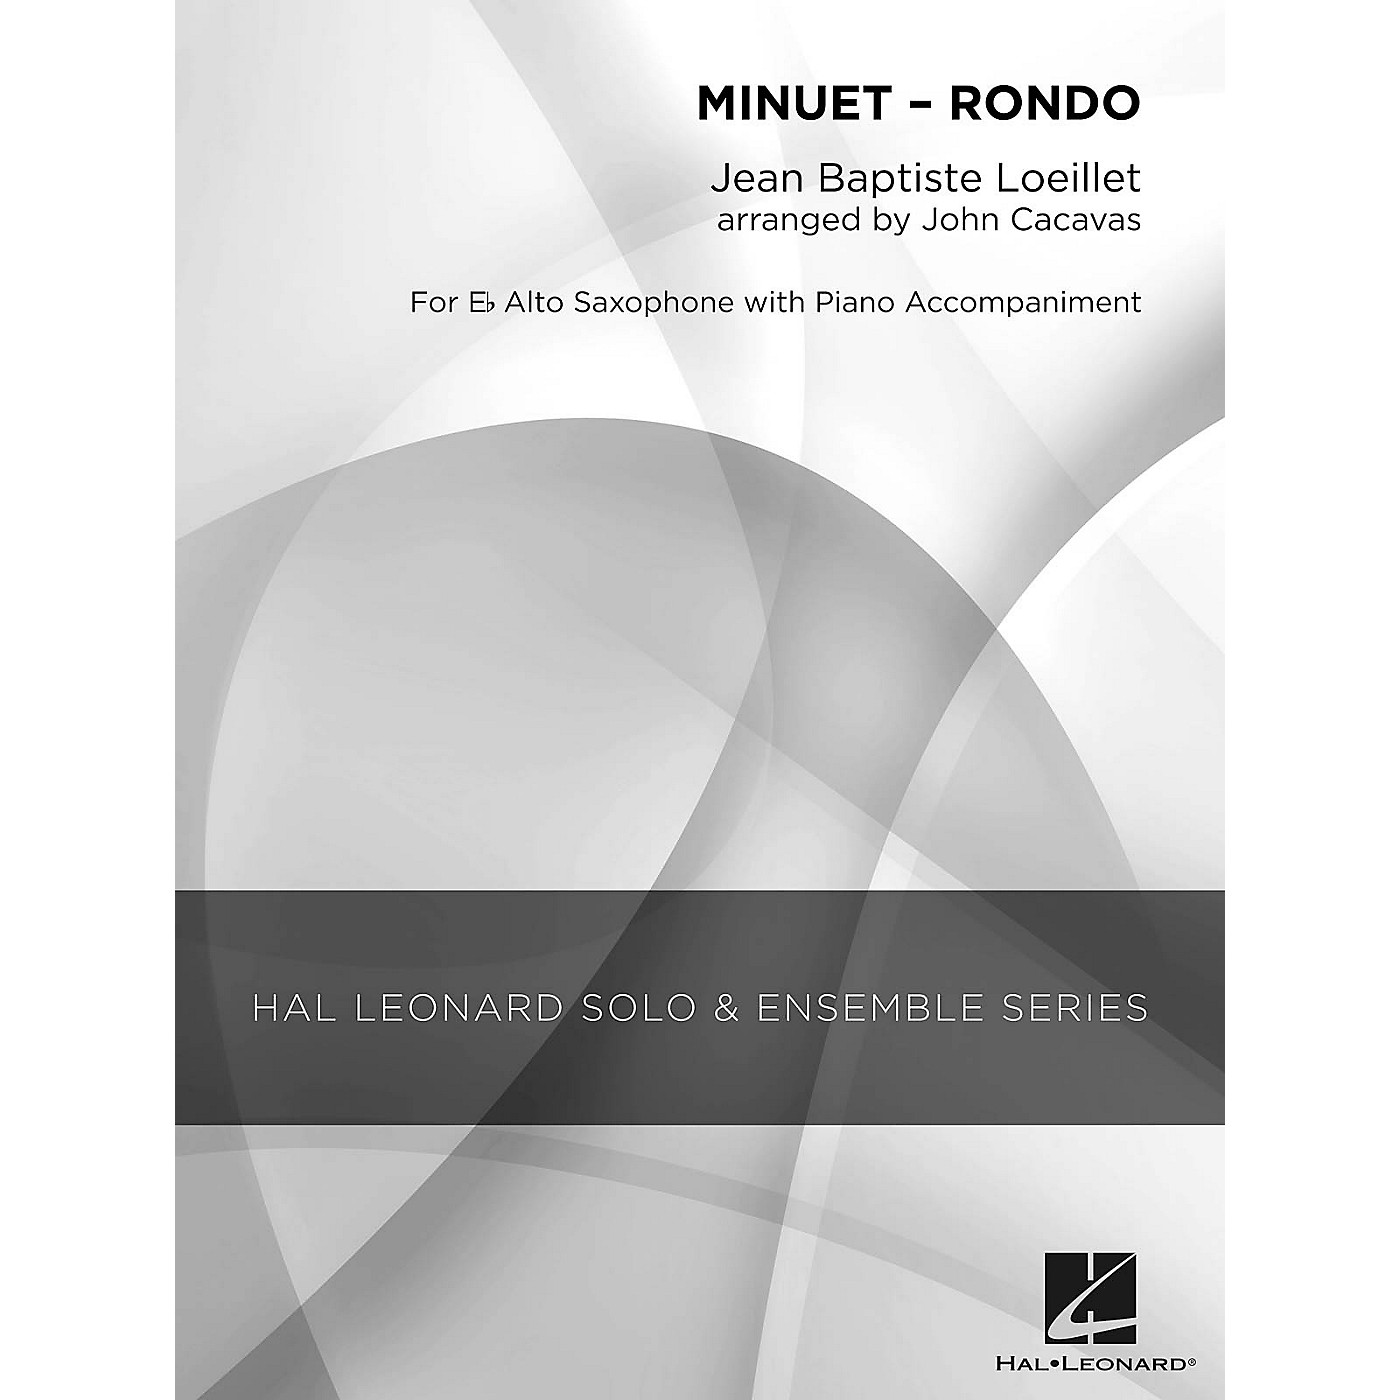 Hal Leonard Minuet - Rondo (Grade 2.5 Alto Saxophone Solo) Concert Band Level 2.5 Arranged by John Cacavas thumbnail